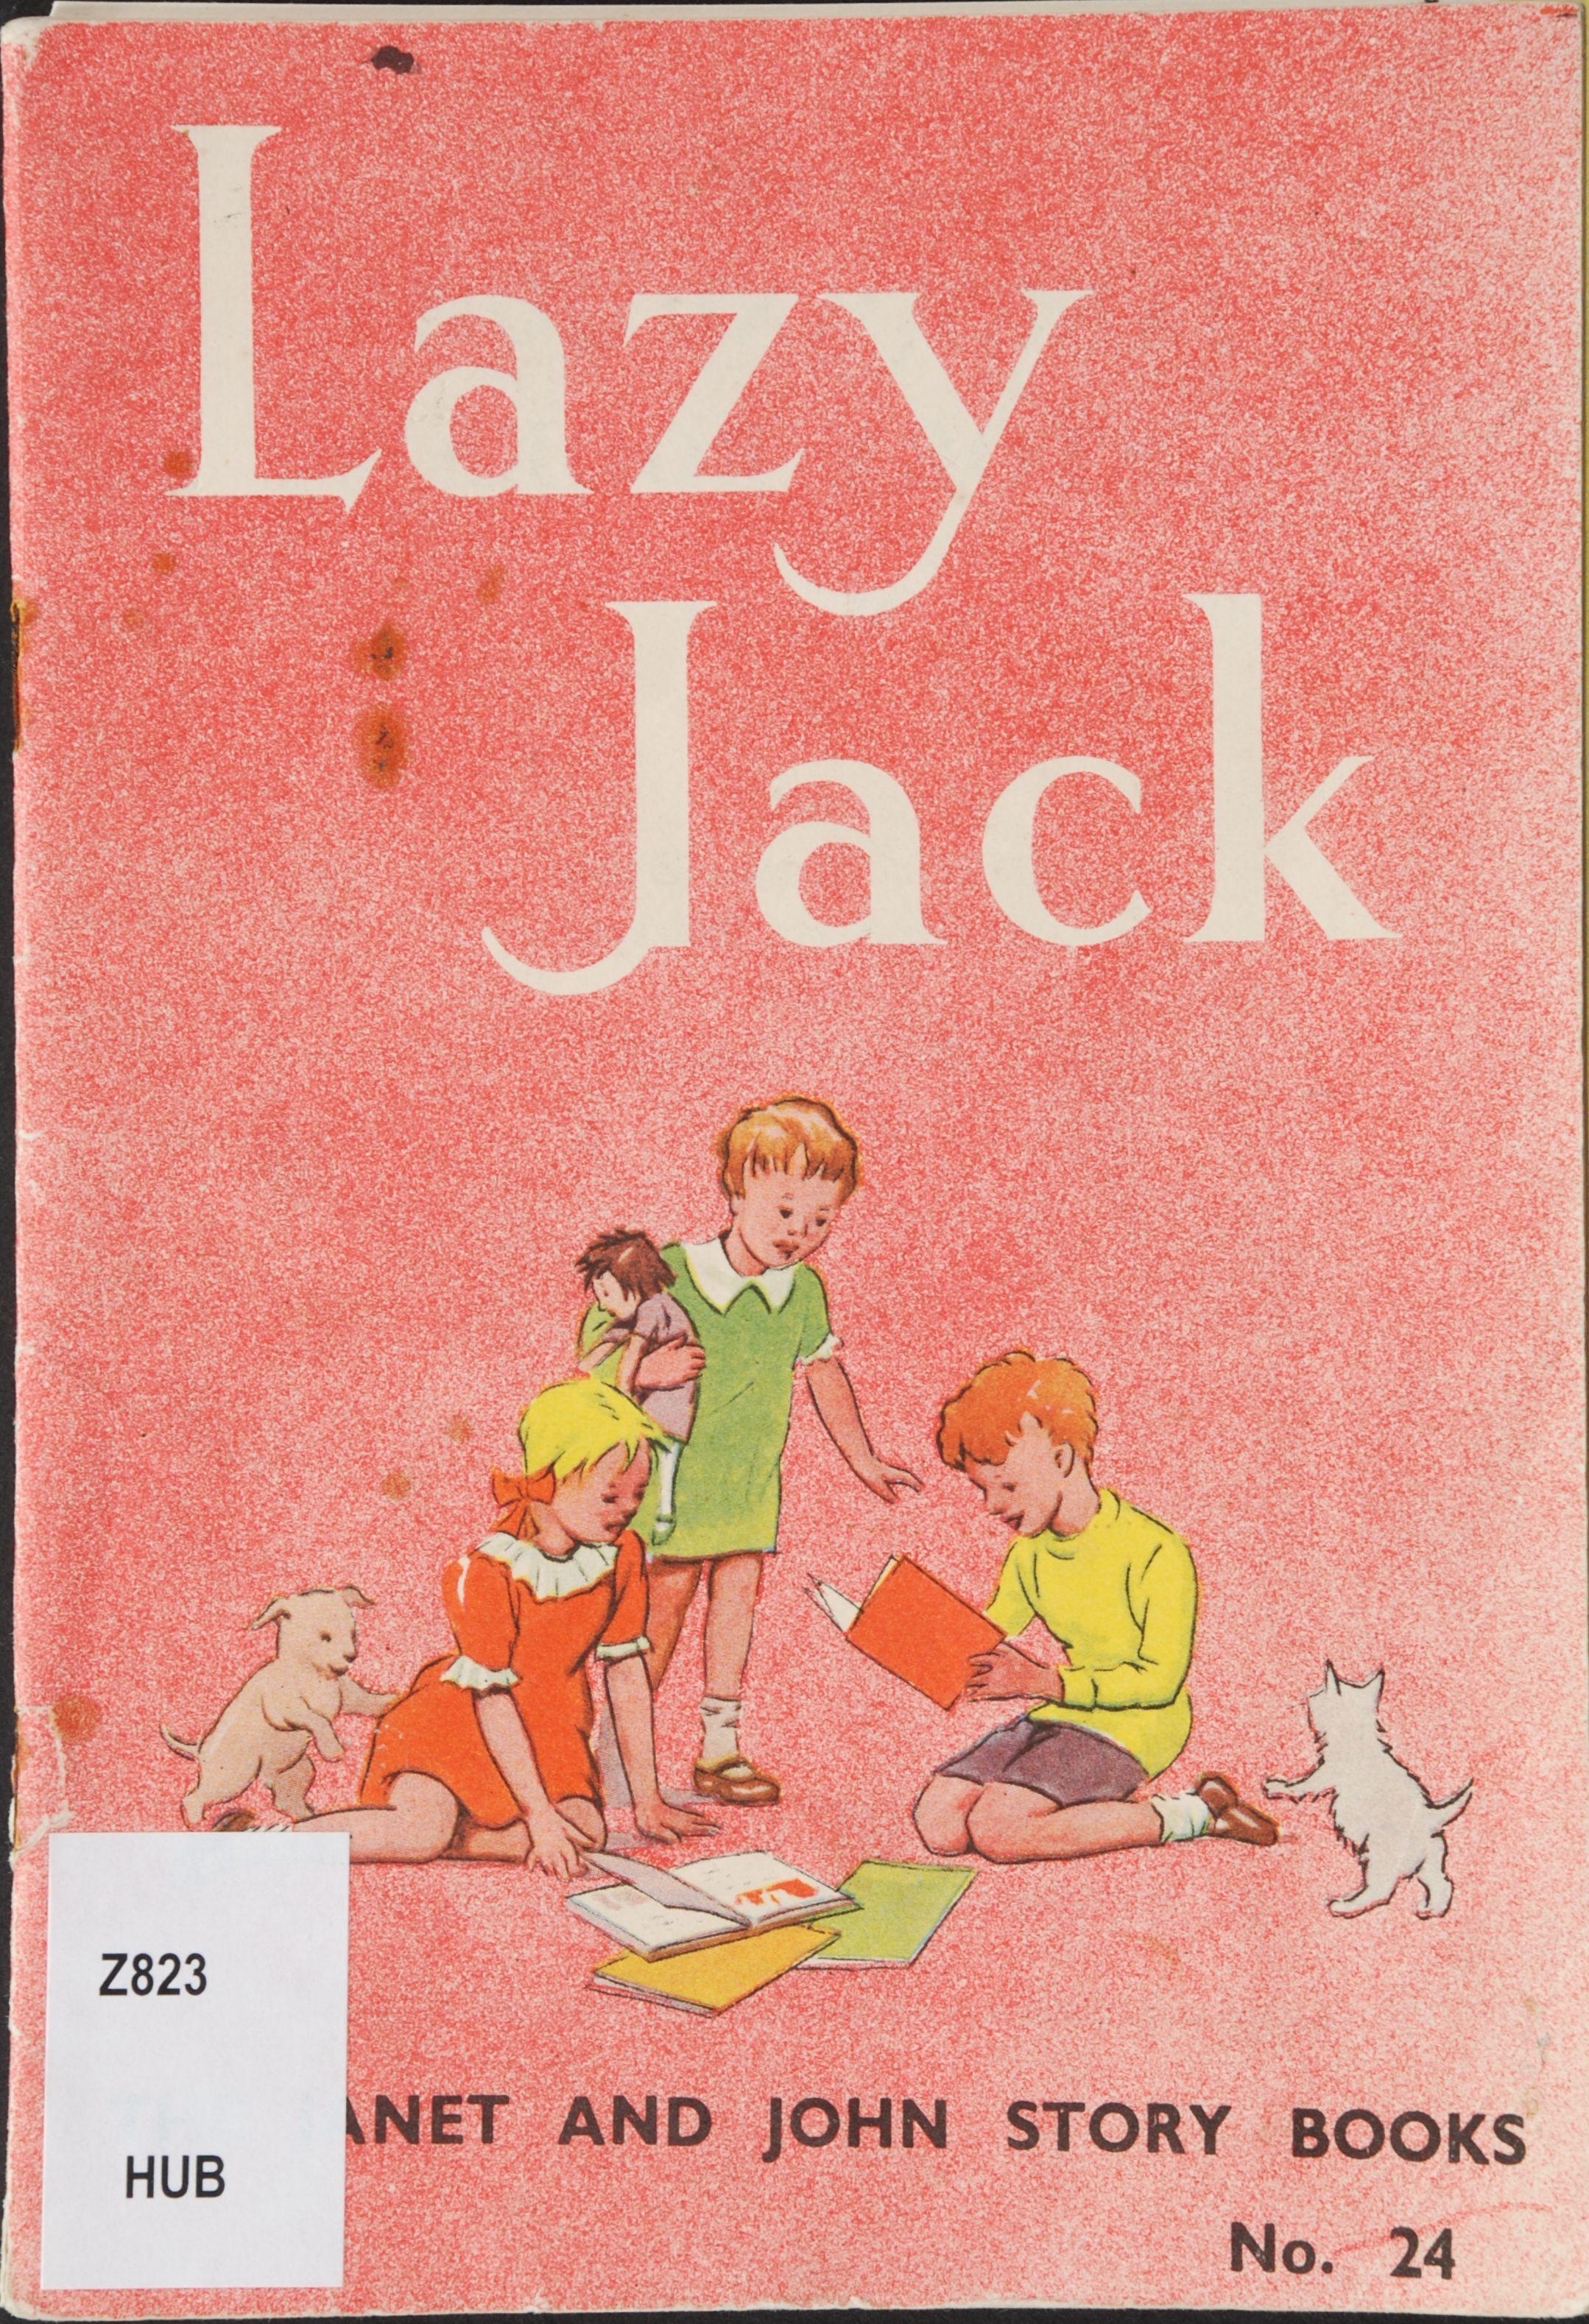 Miriam Blanton Huber. Lazy Jack. Welwyn, Herts.: Nisbet, 1951.